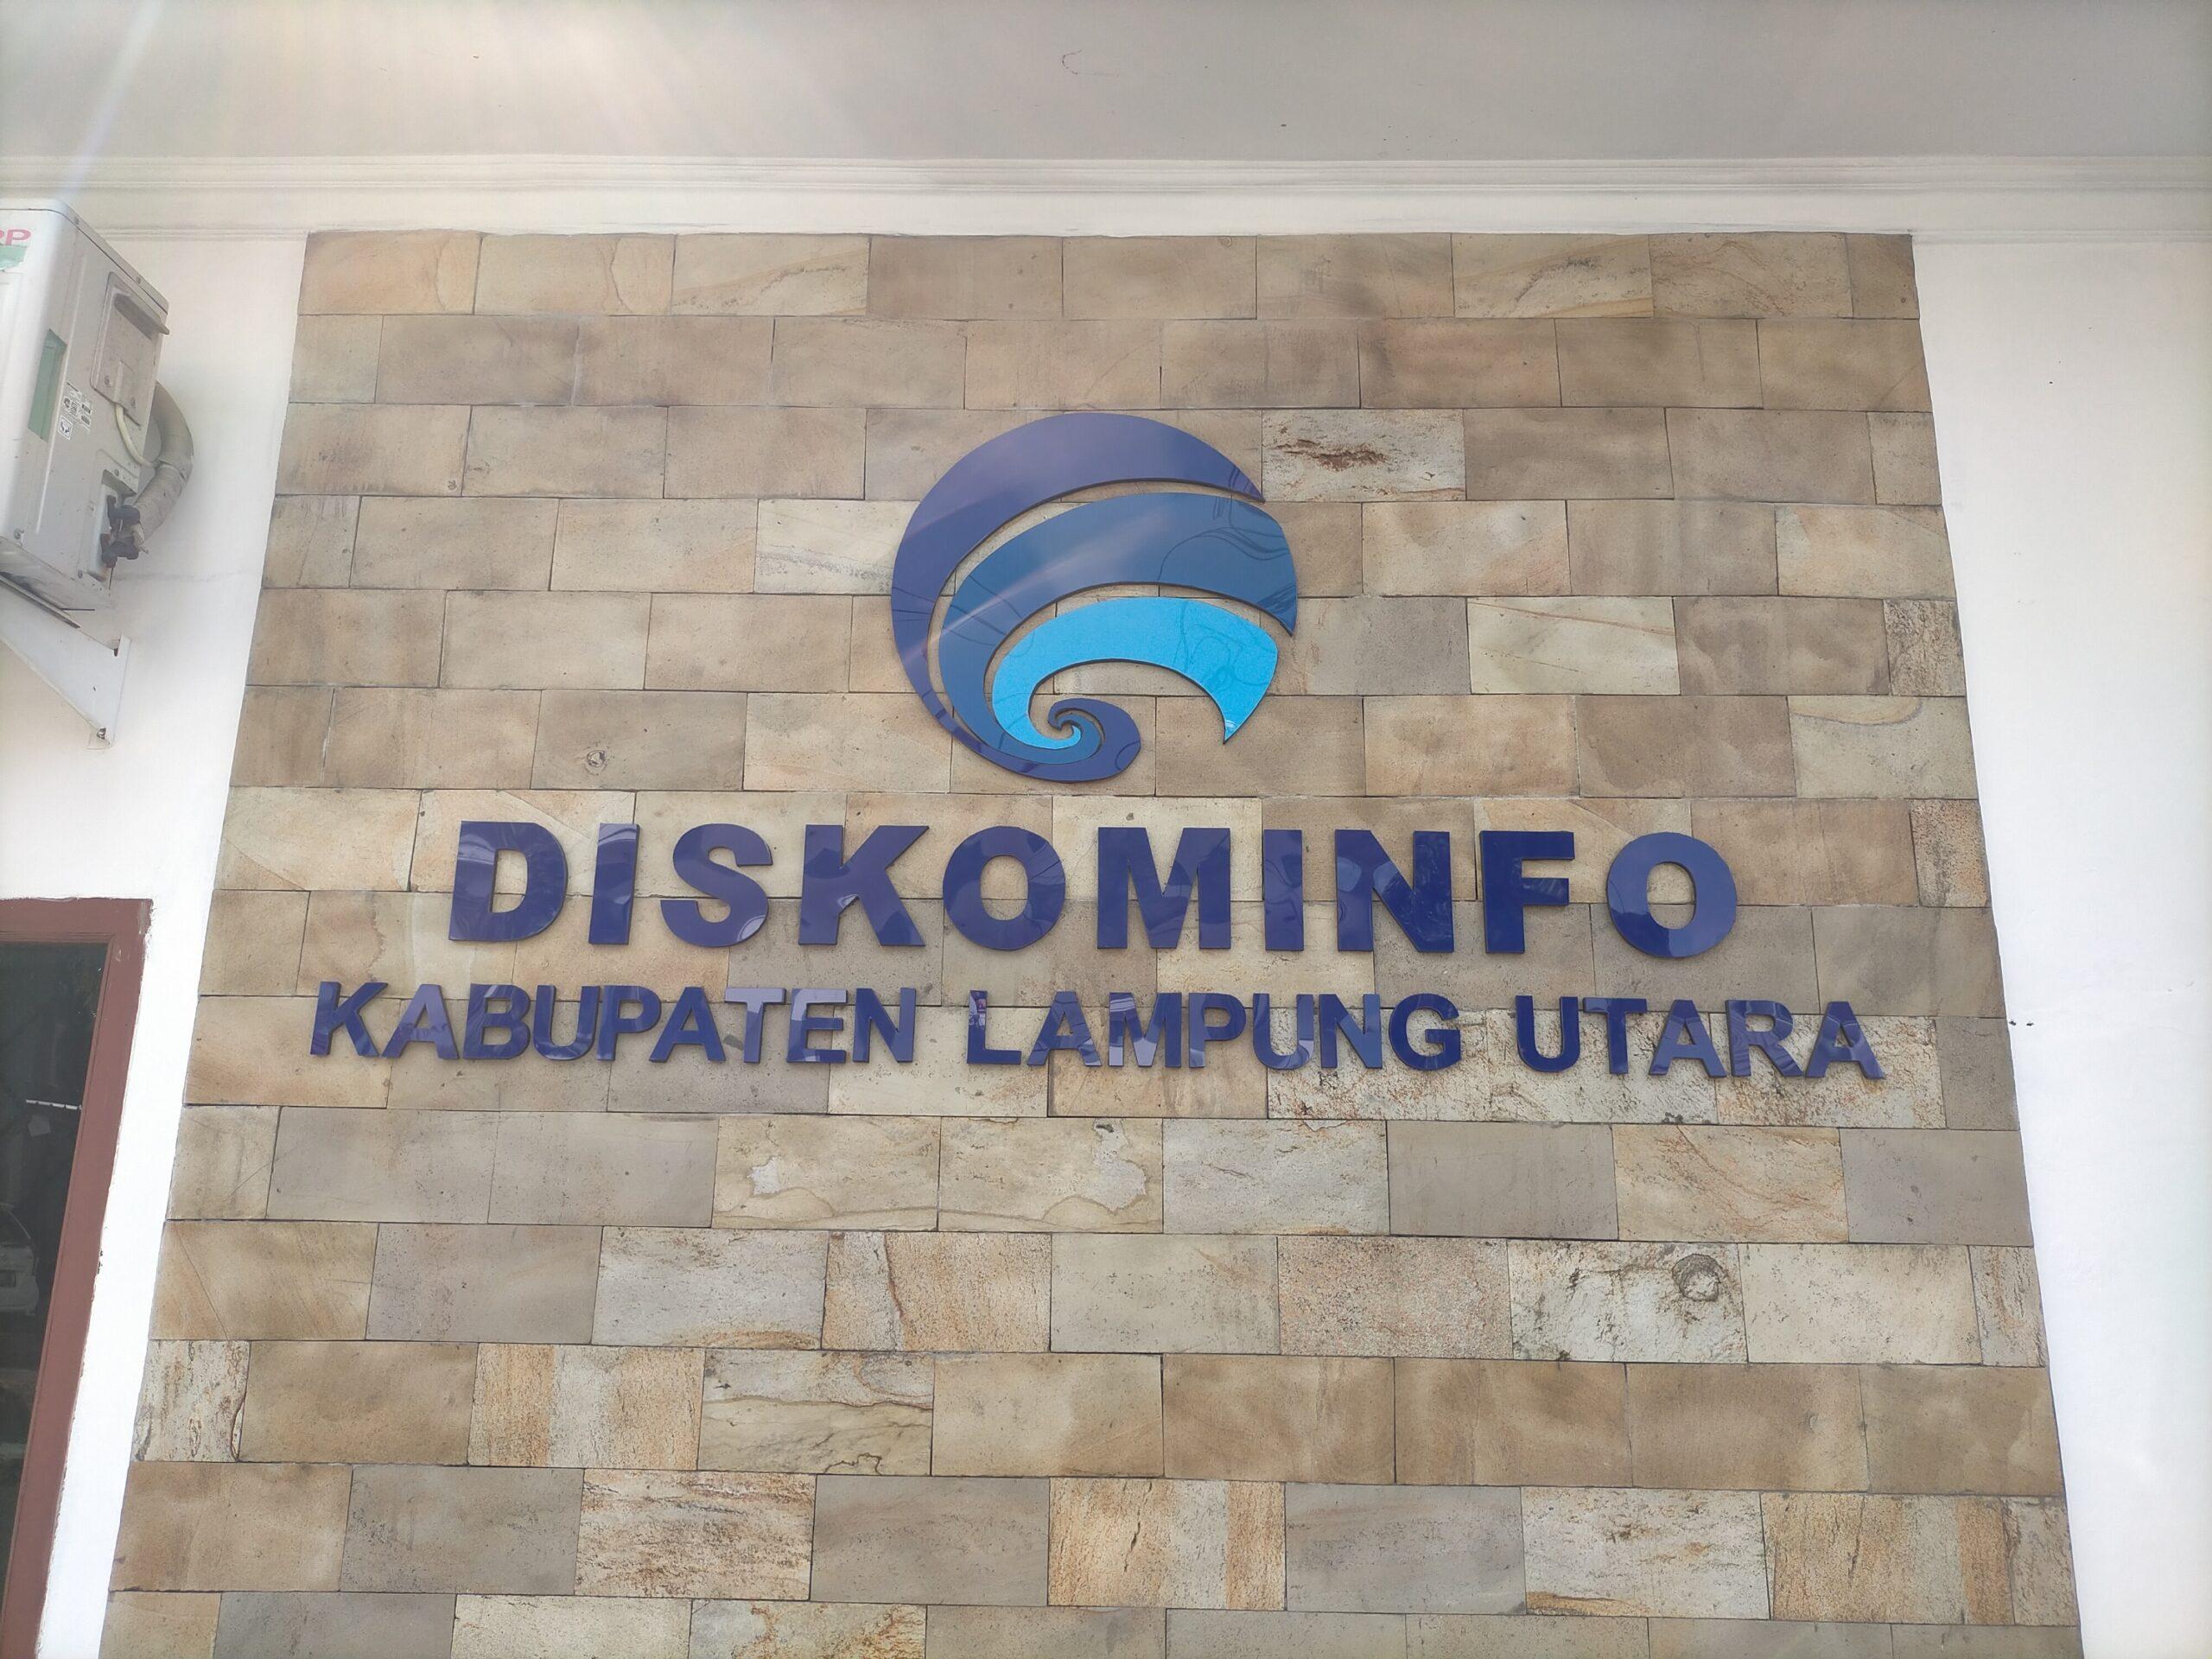 Oknum ASN Kominfo Lampung Utara Info Com, Diduga Menghabat Pencairan ADV